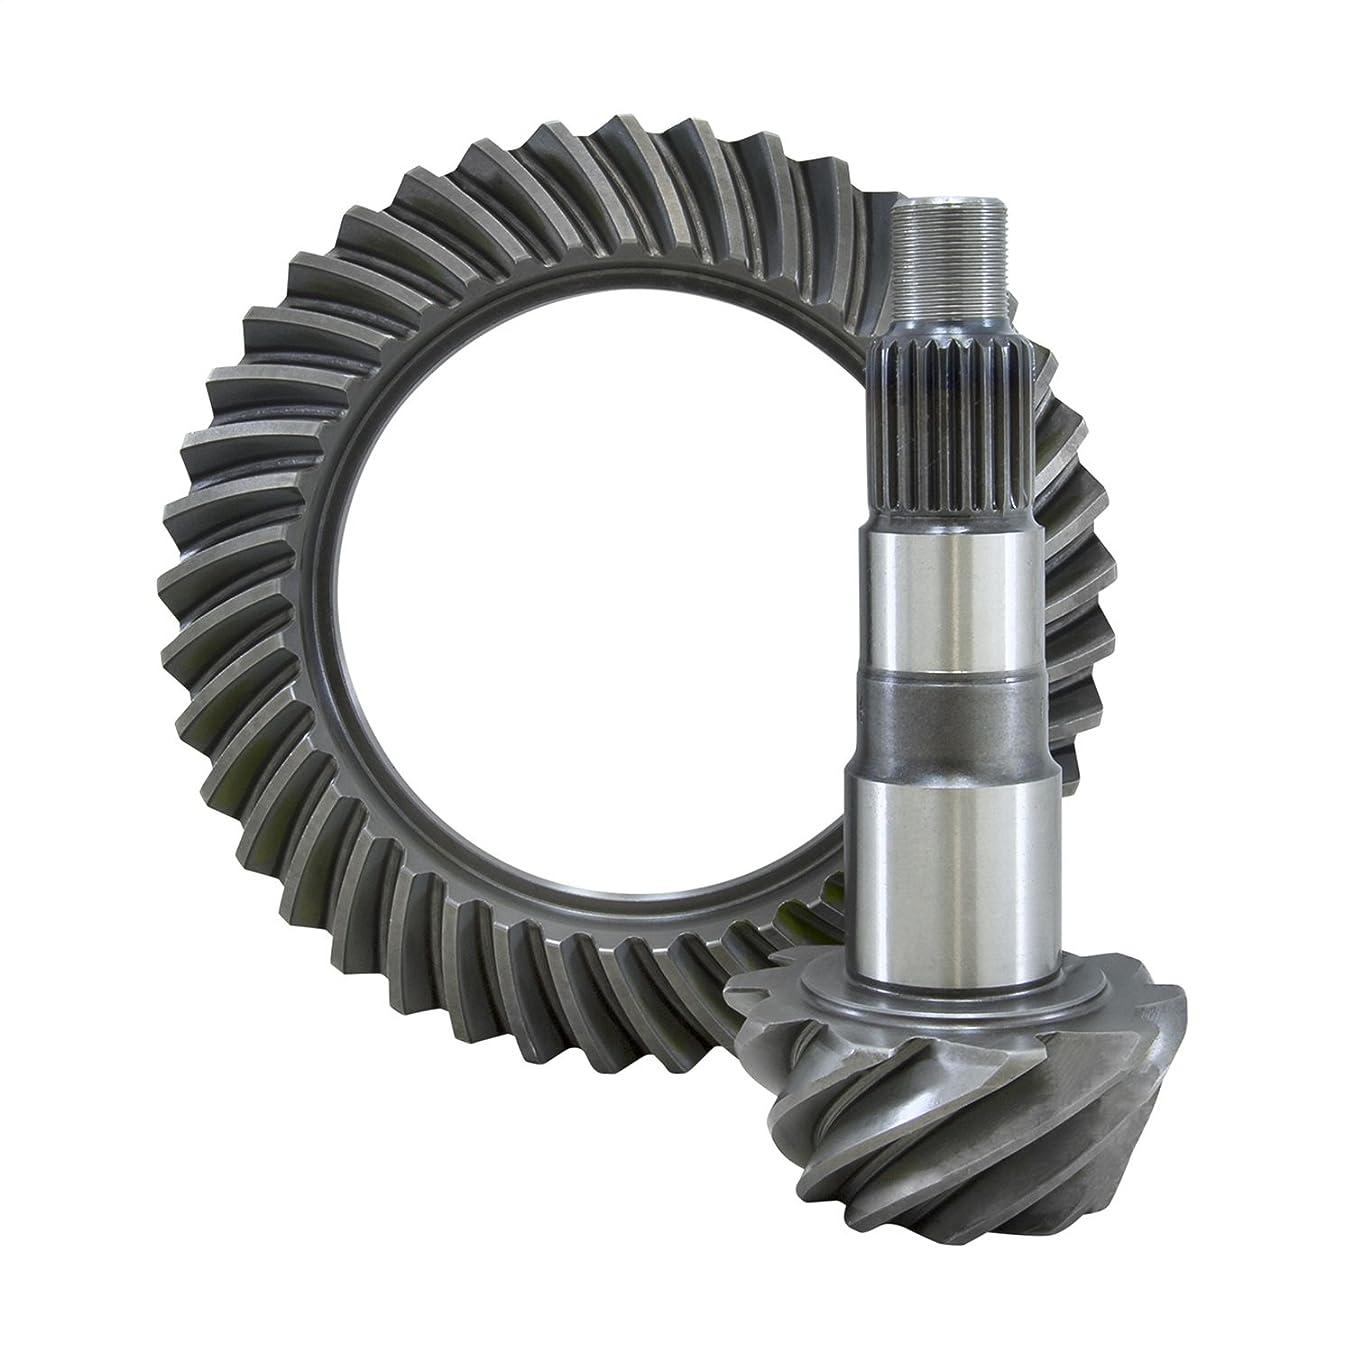 Yukon Gear & Axle (YG D50R-373R) High Performance Ring & Pinion Gear Set for Dana 50 Reverse Rotation Differential